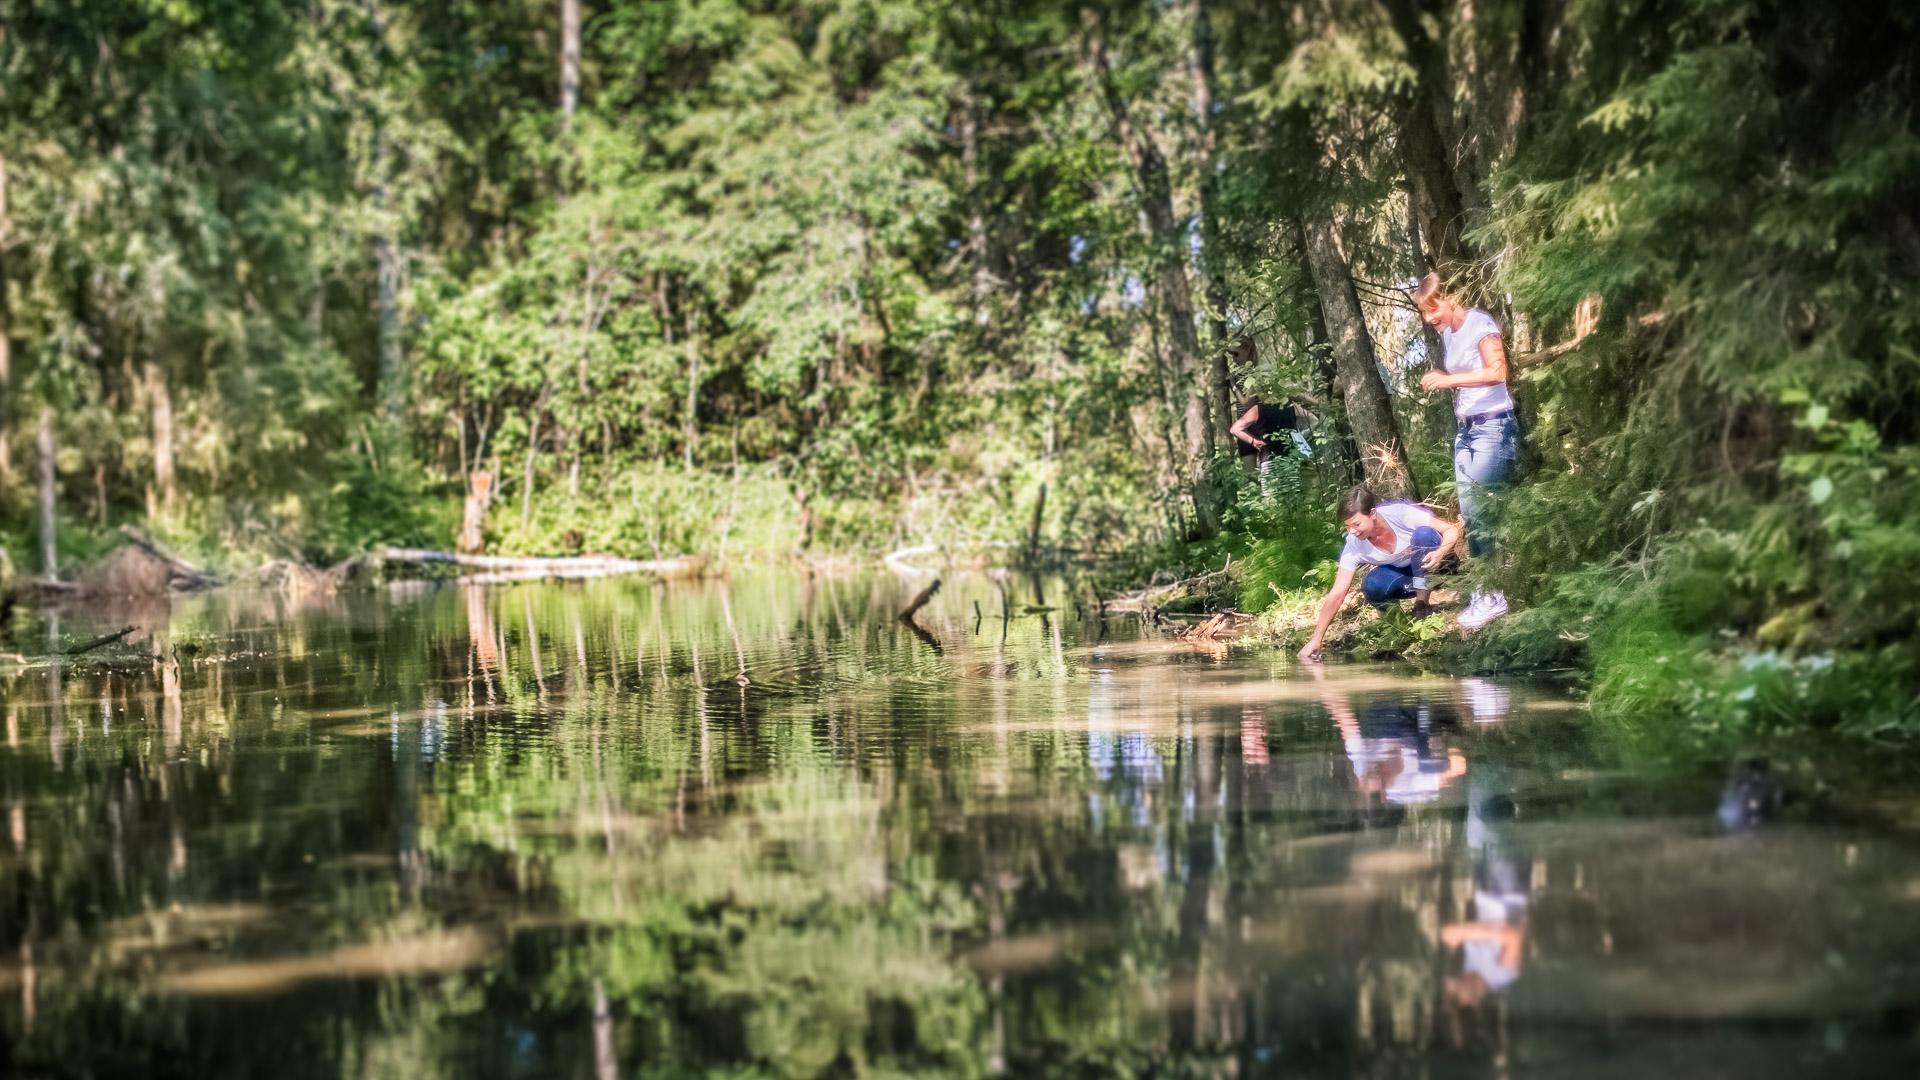 Visit Tampere Korsuretket Patikointi Hiking Forest Nature Laura Vanzo 14